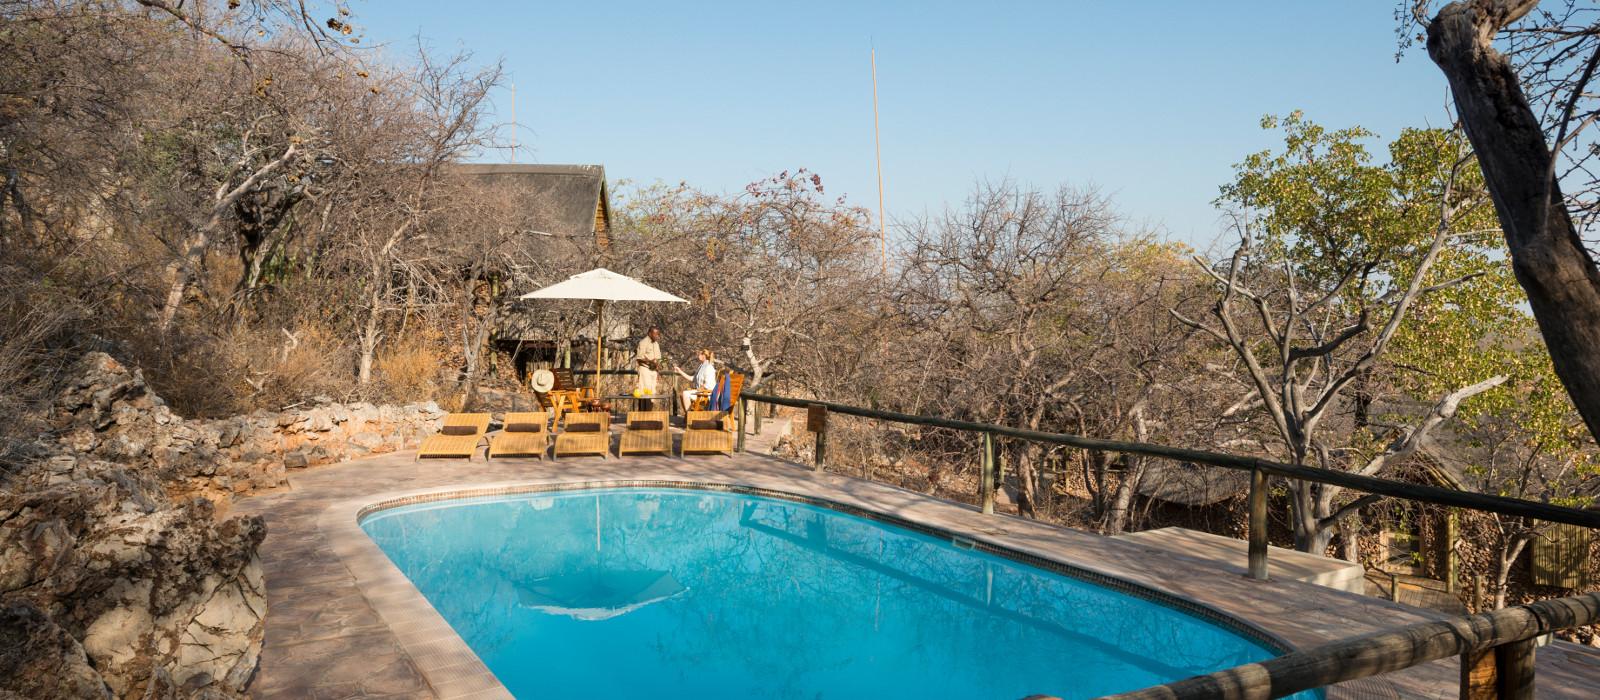 Hotel Ongava Lodge Namibia